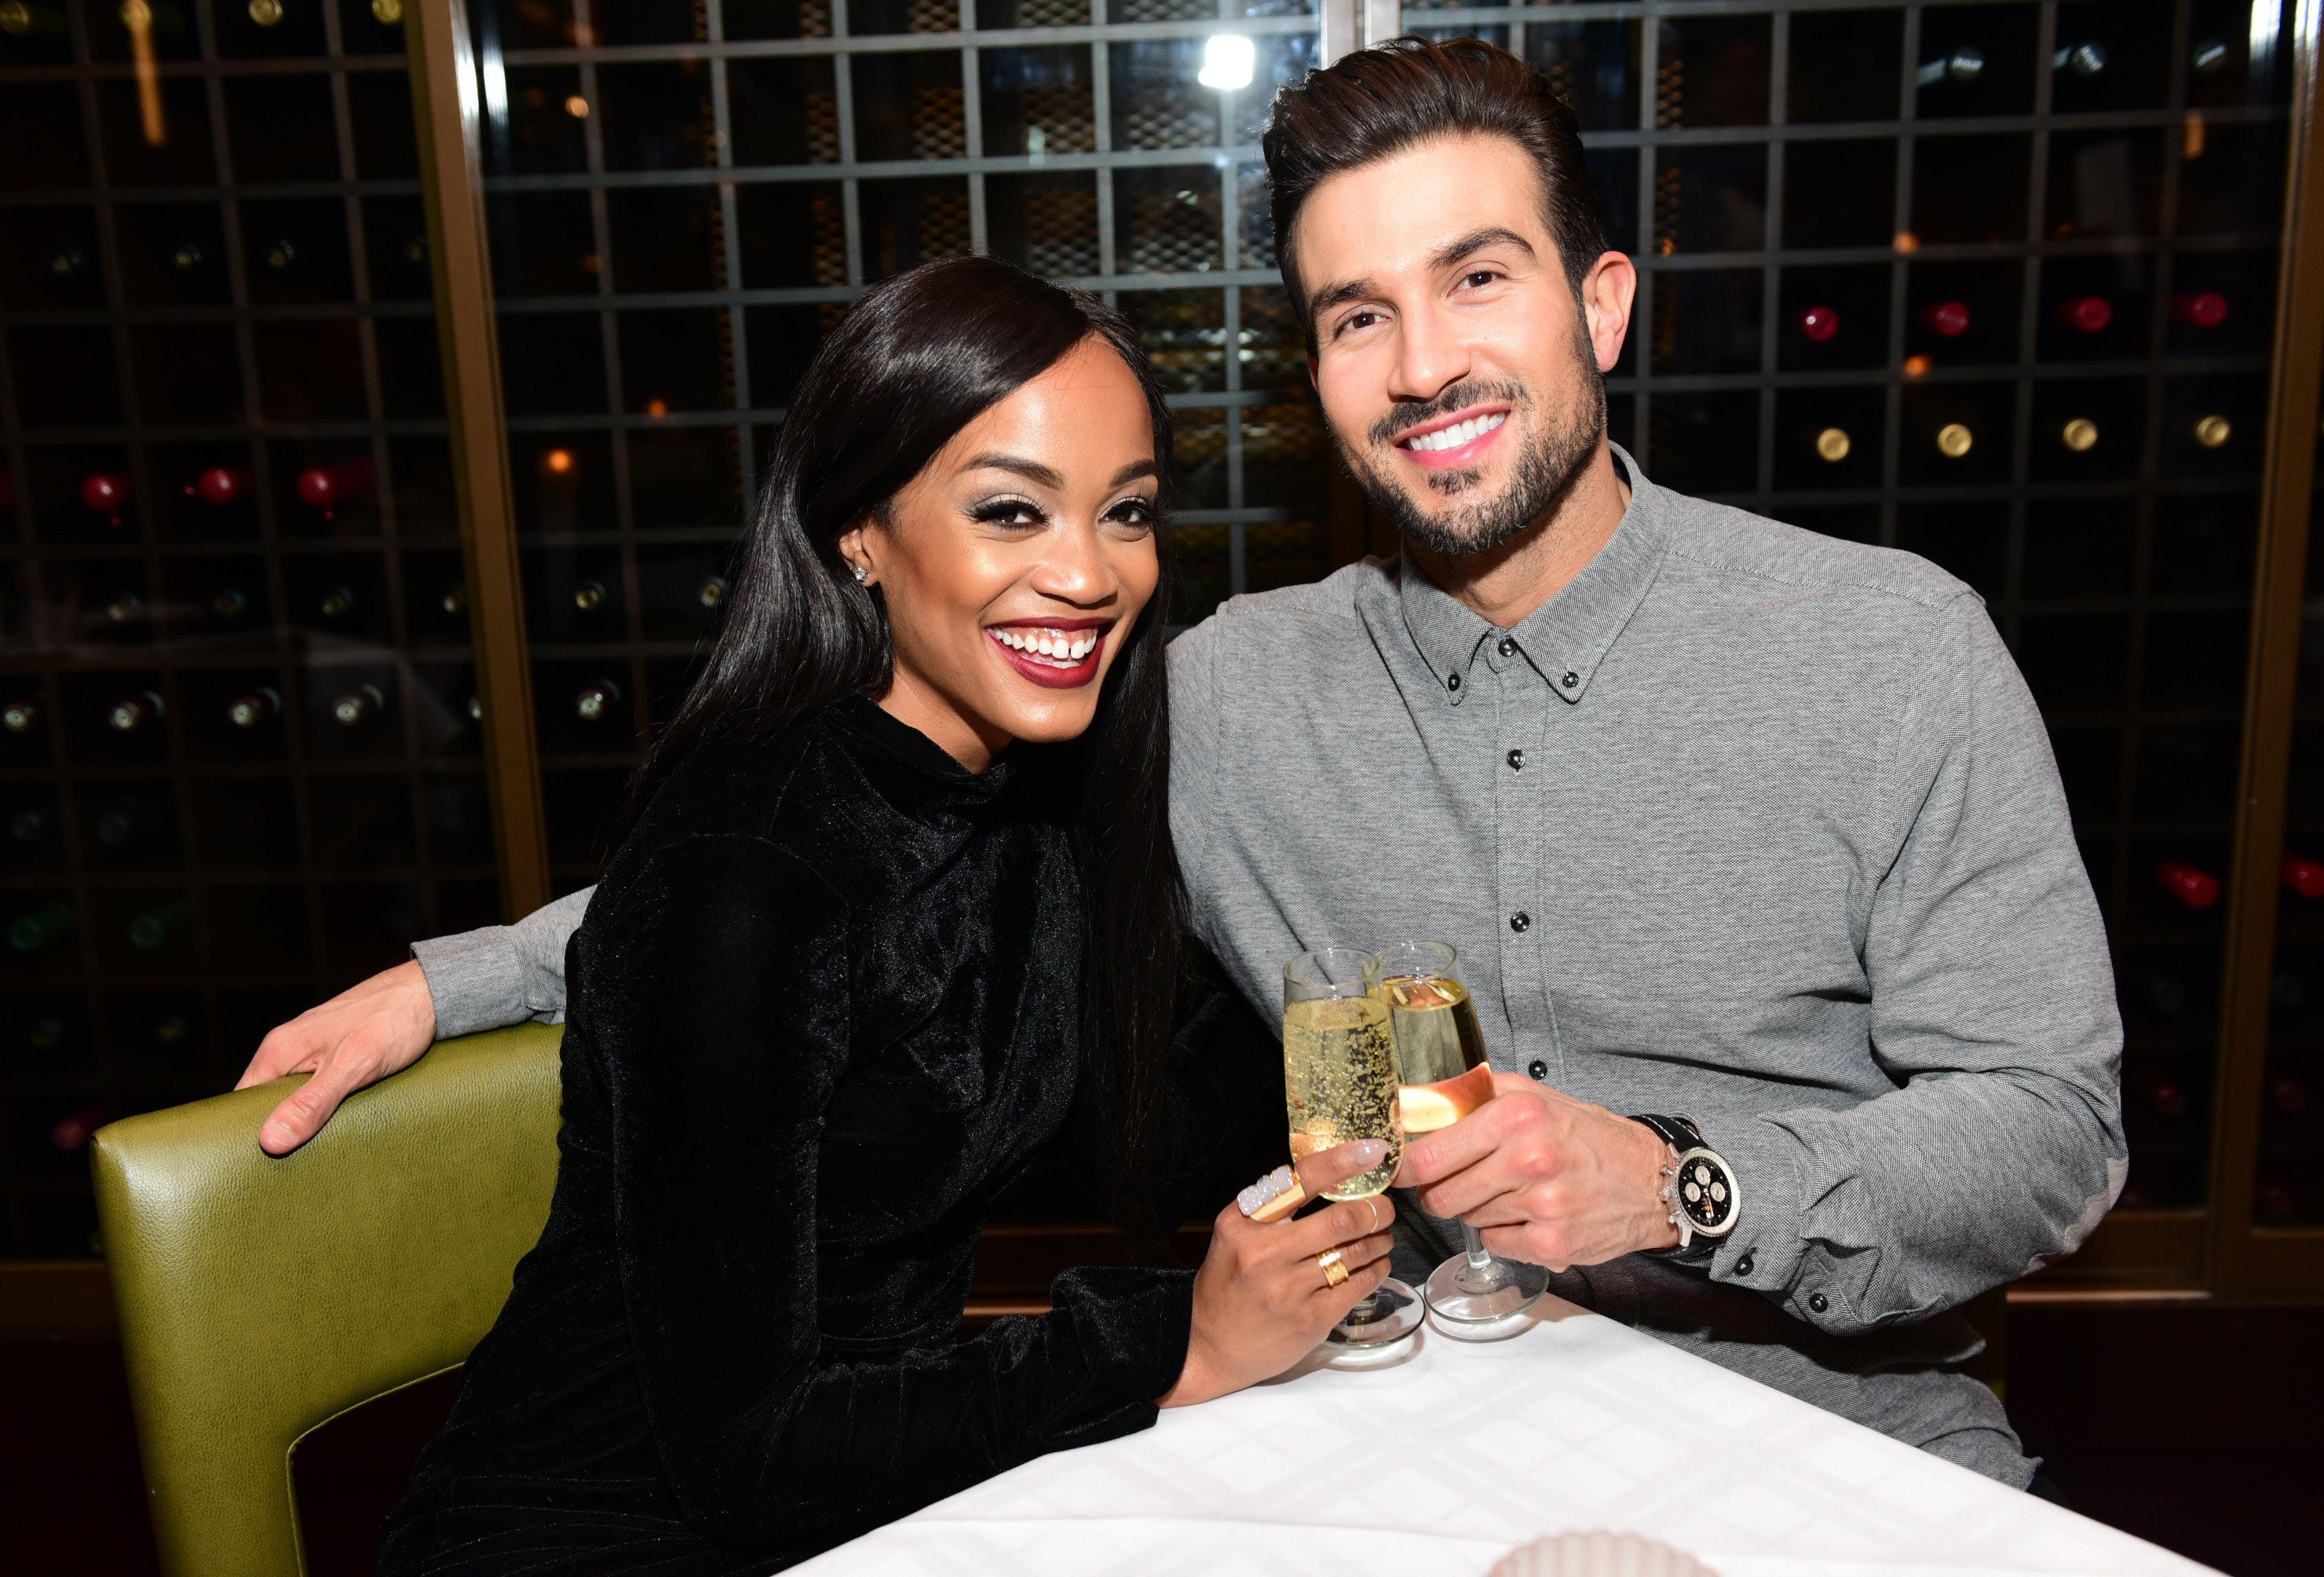 interracial dating in miami